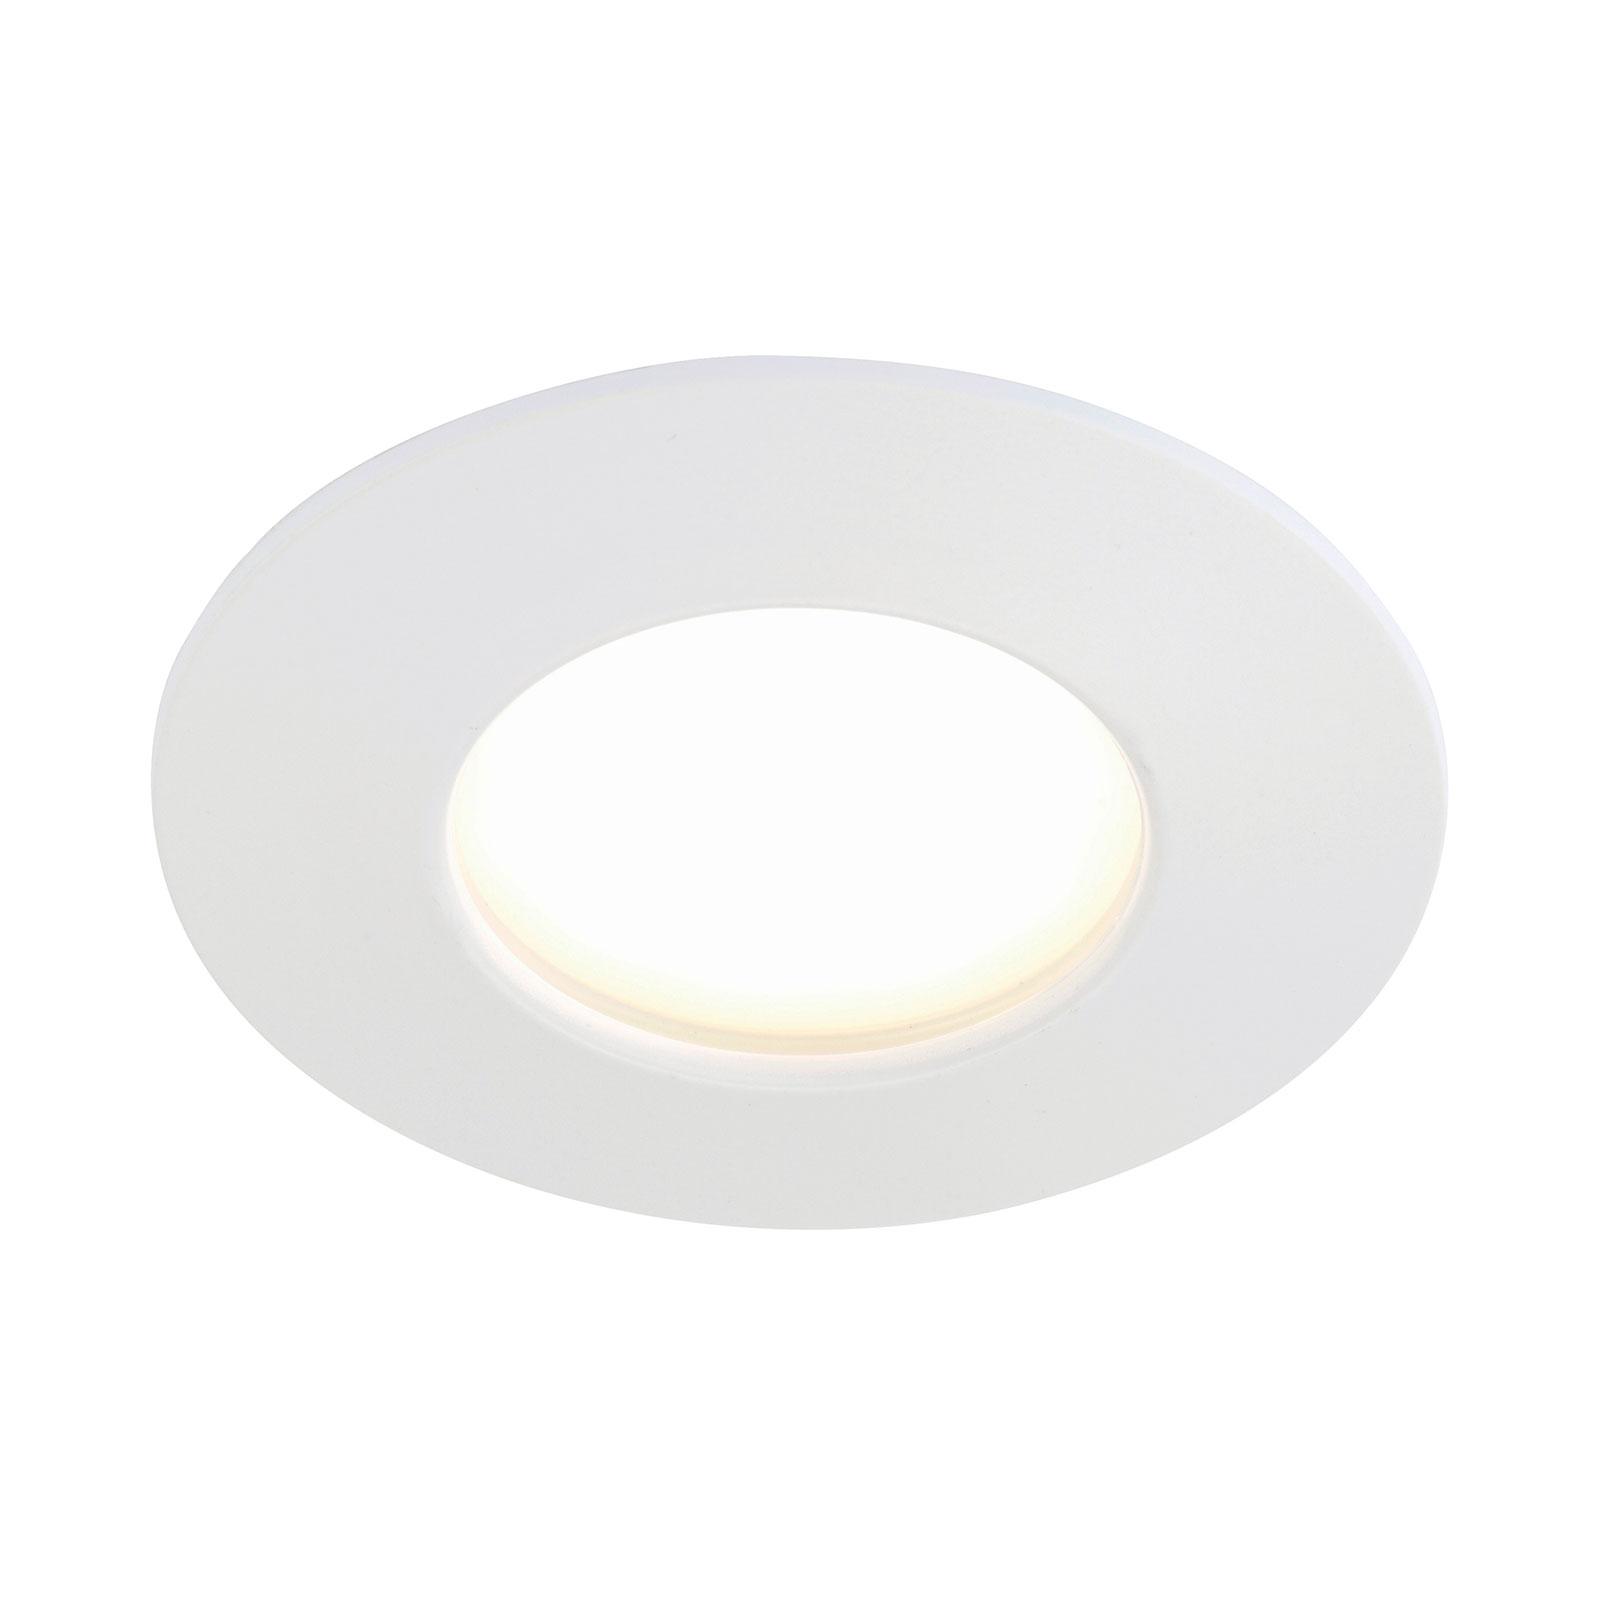 Downlight LED Till da esterni, bianco